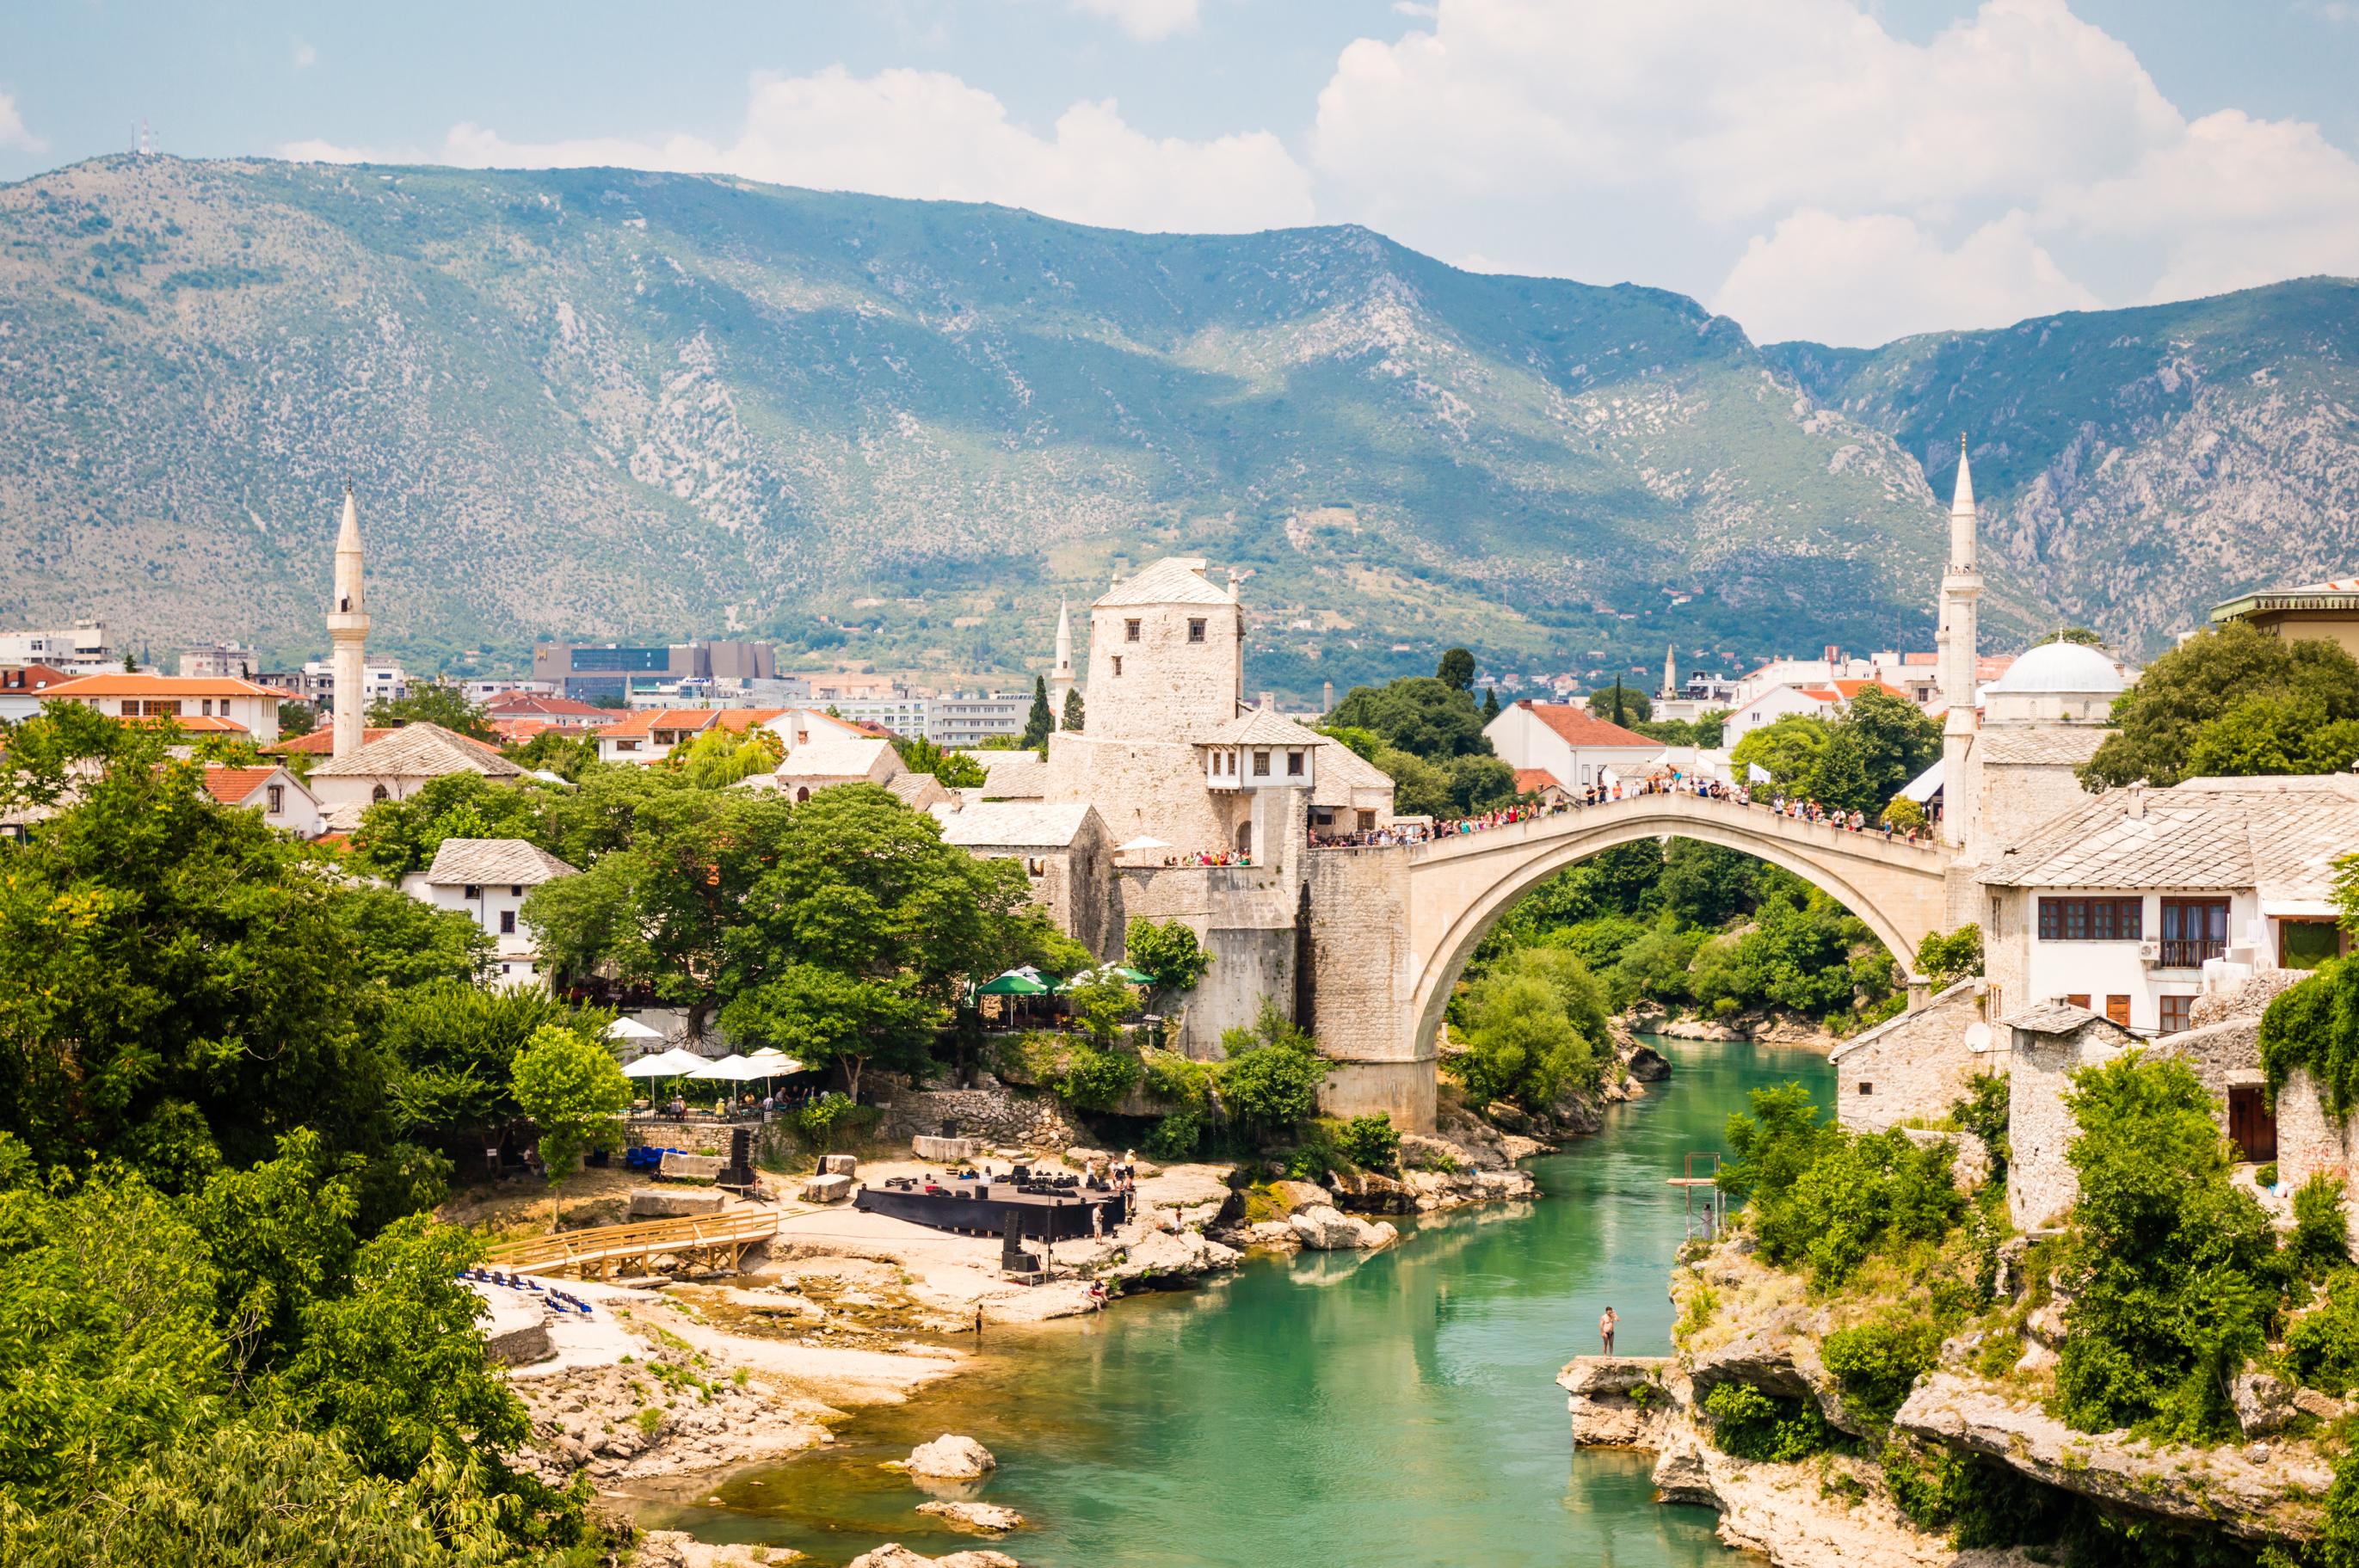 Don't Forget, Mostar - Croacia Circuito Croacia Total: de Zagreb a Dubrovnik